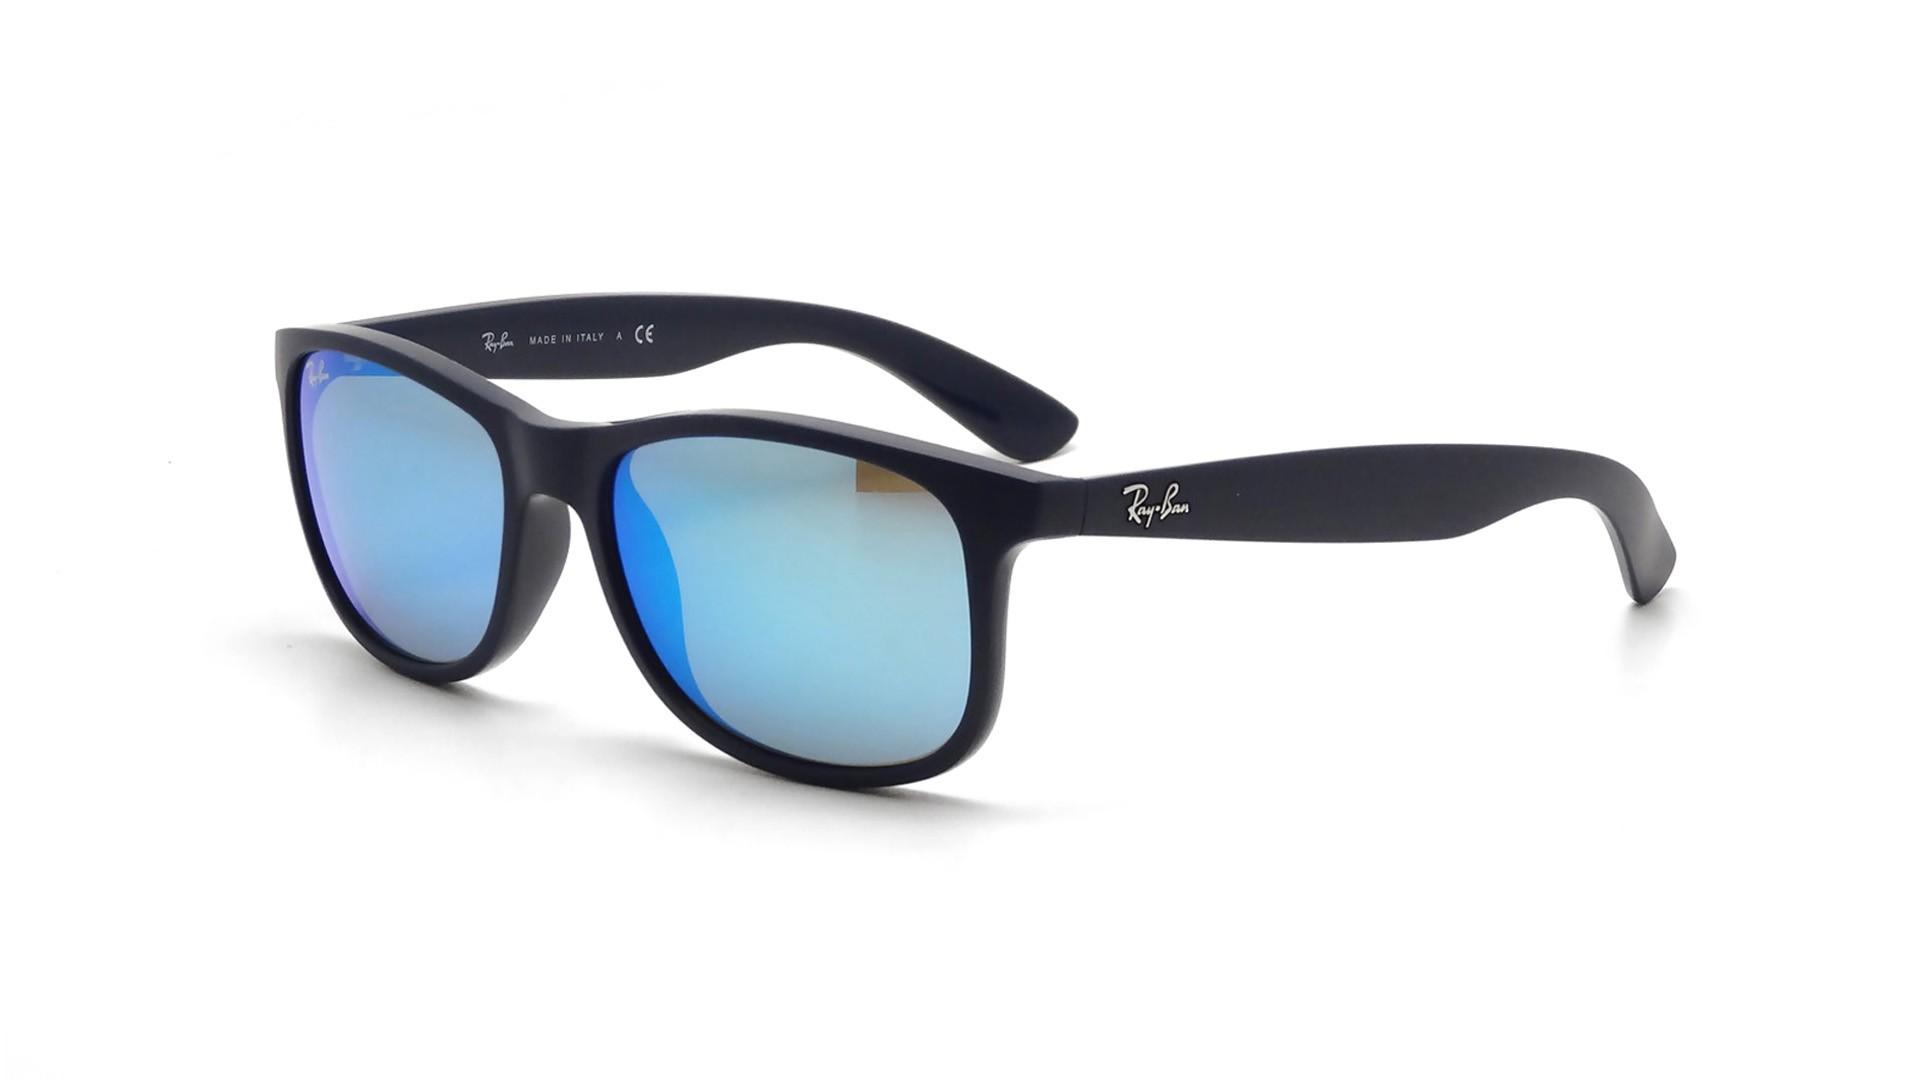 lunette ray ban femme verre bleu